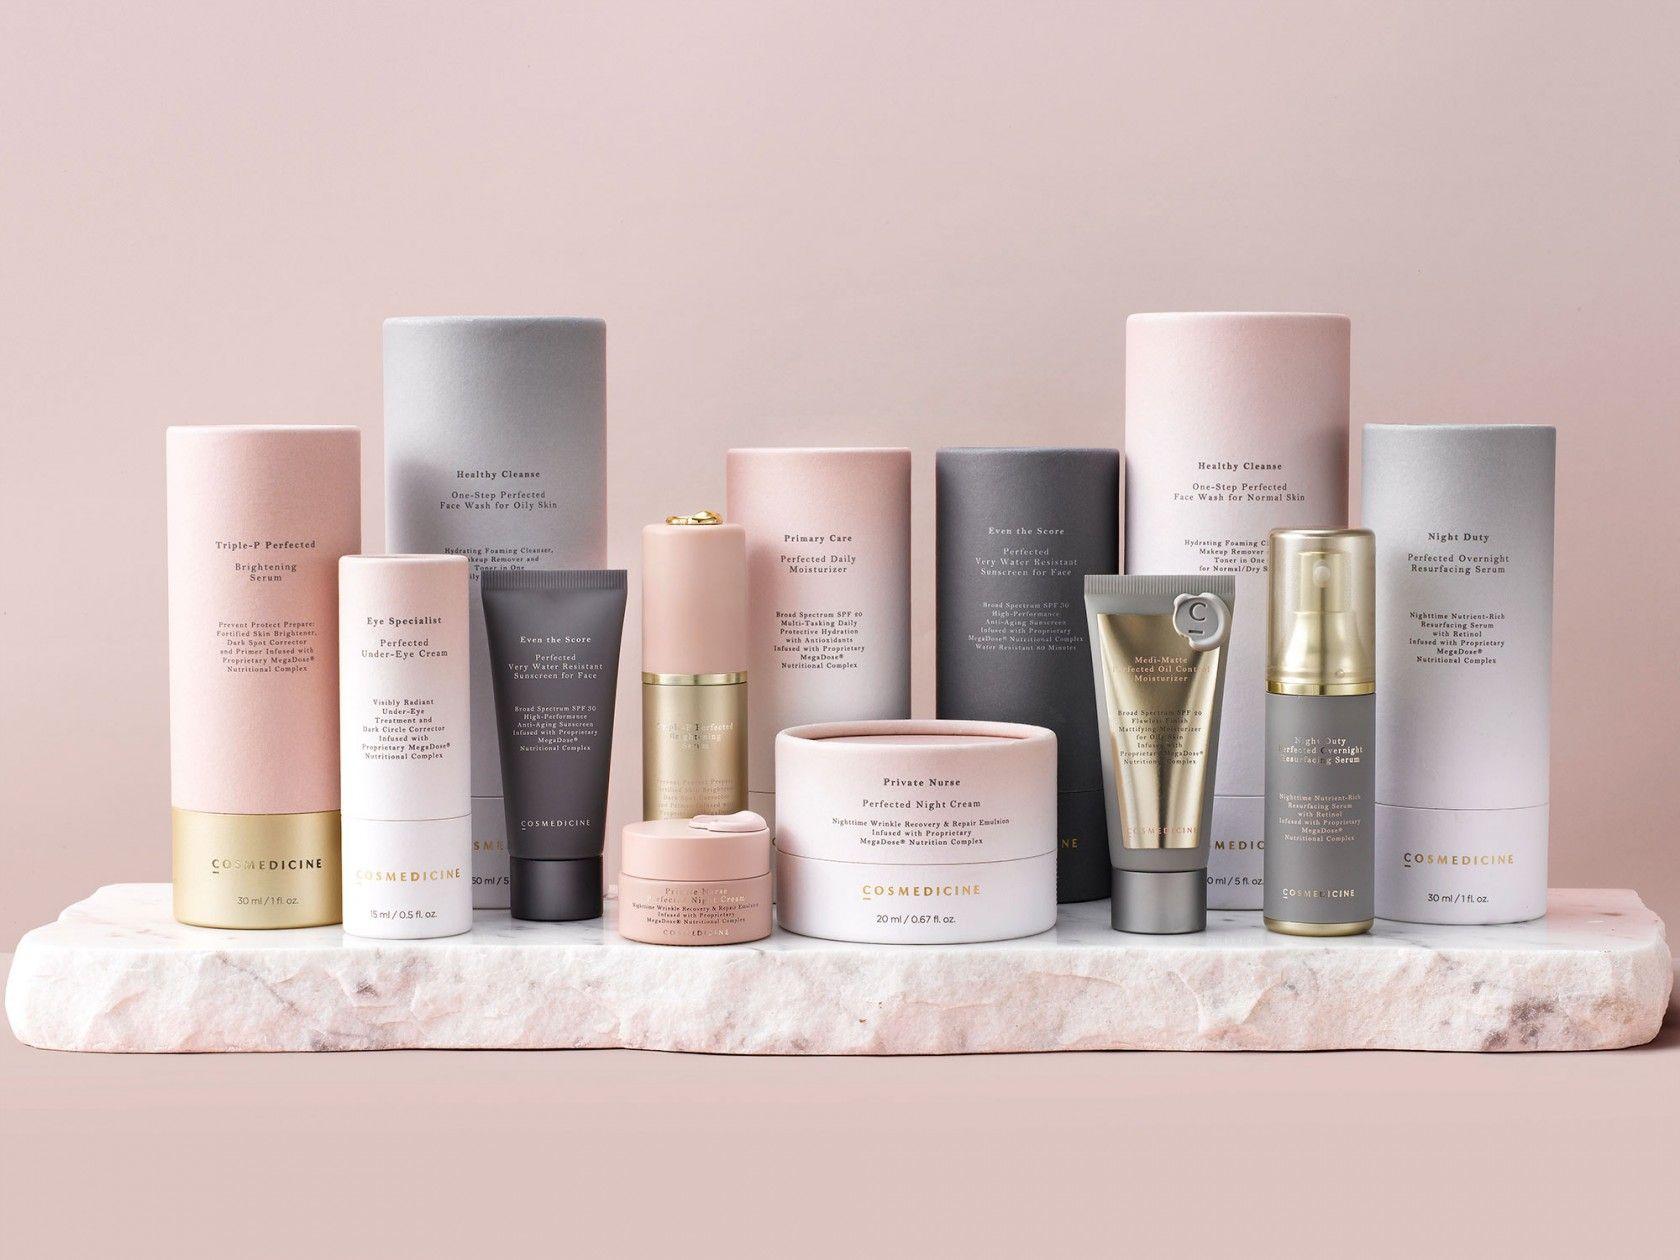 COSMEDICINE Cosmetic packaging, Cosmetic packaging